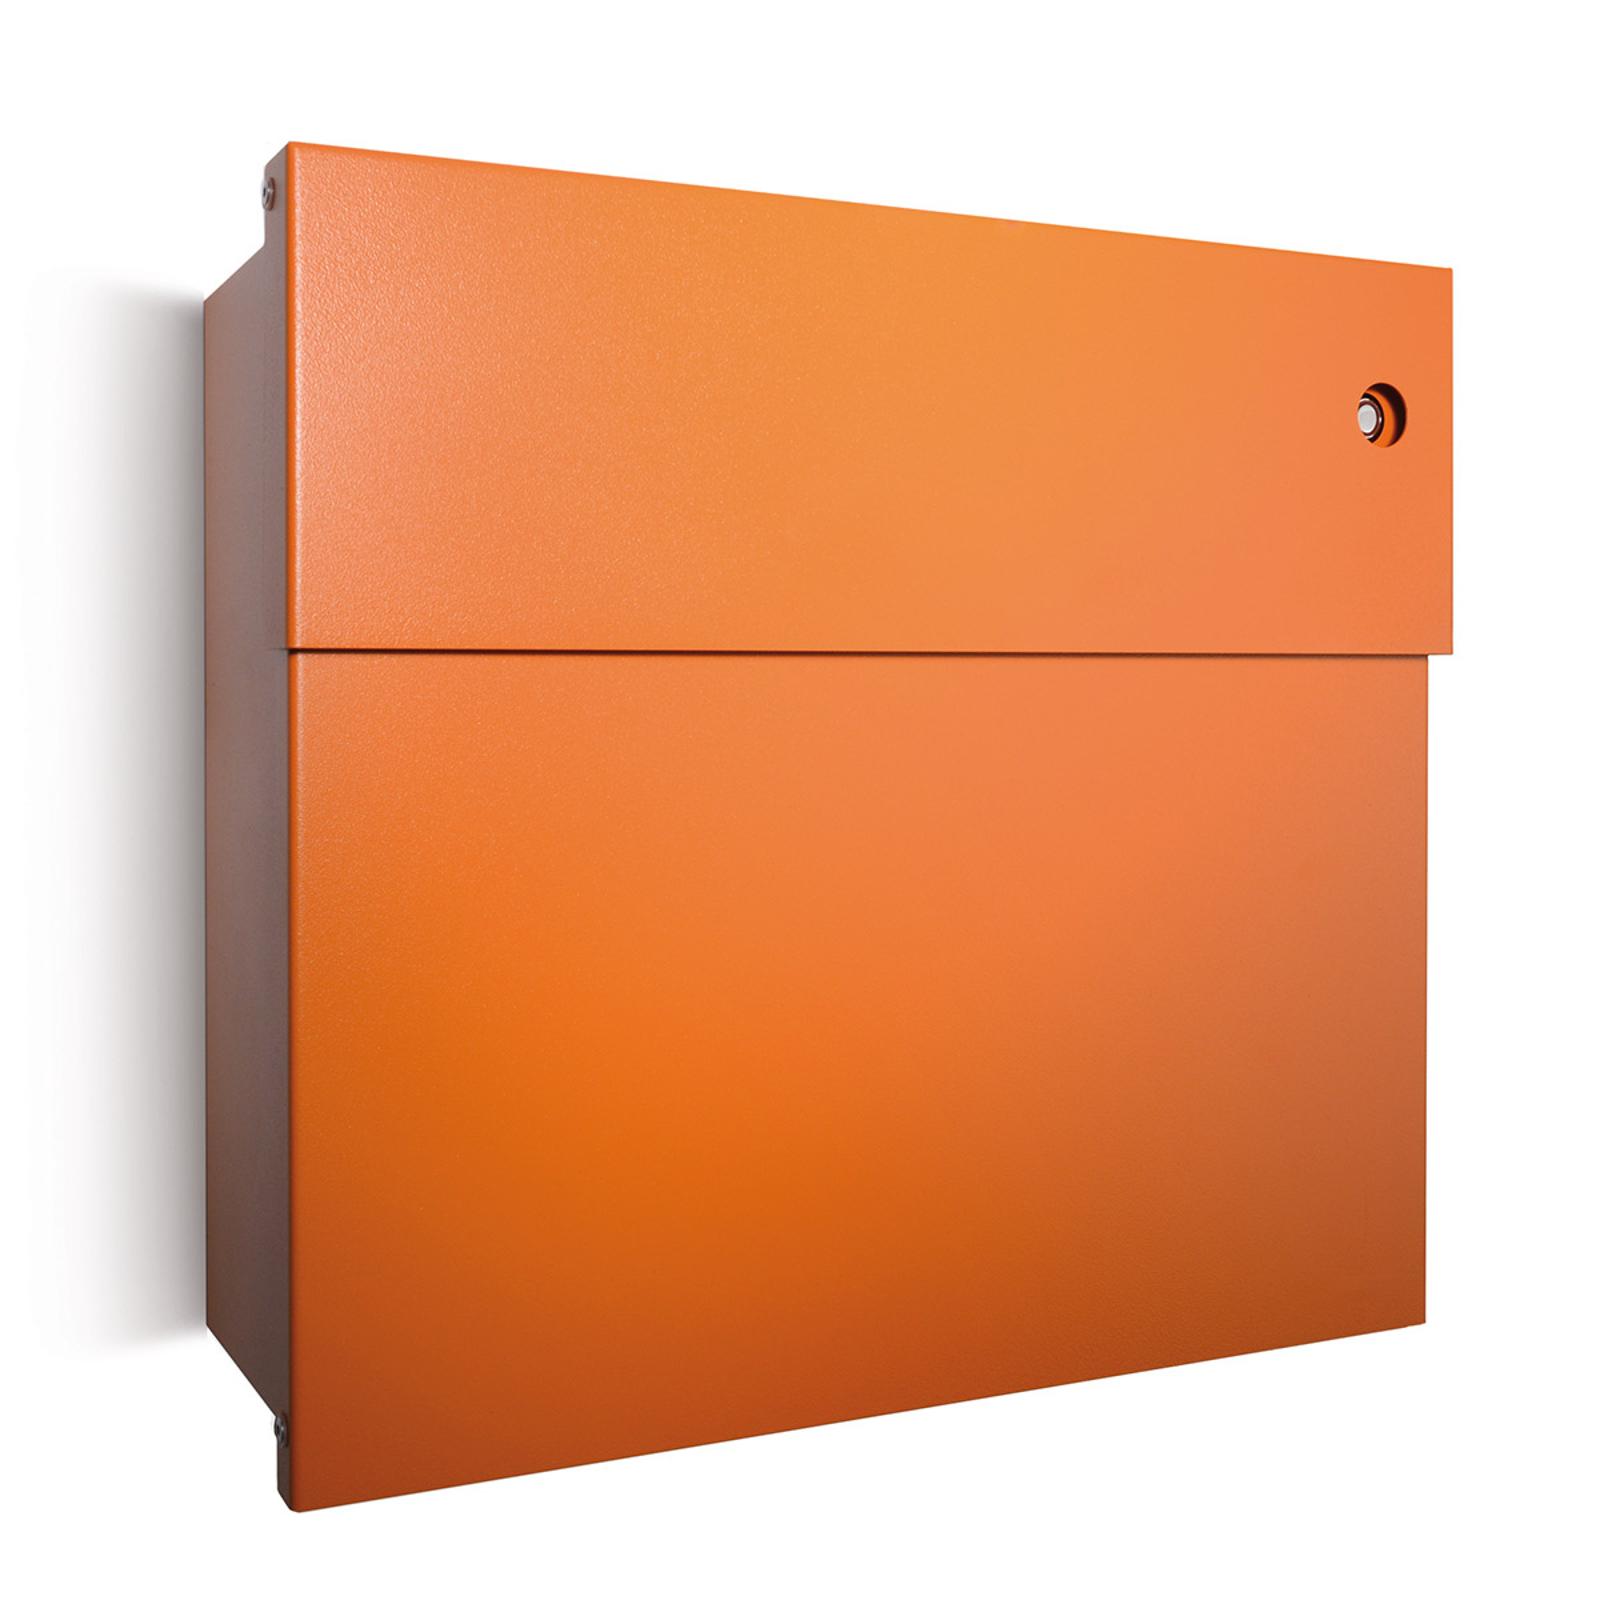 Letterman IV postboks, rød bjelle, oransje